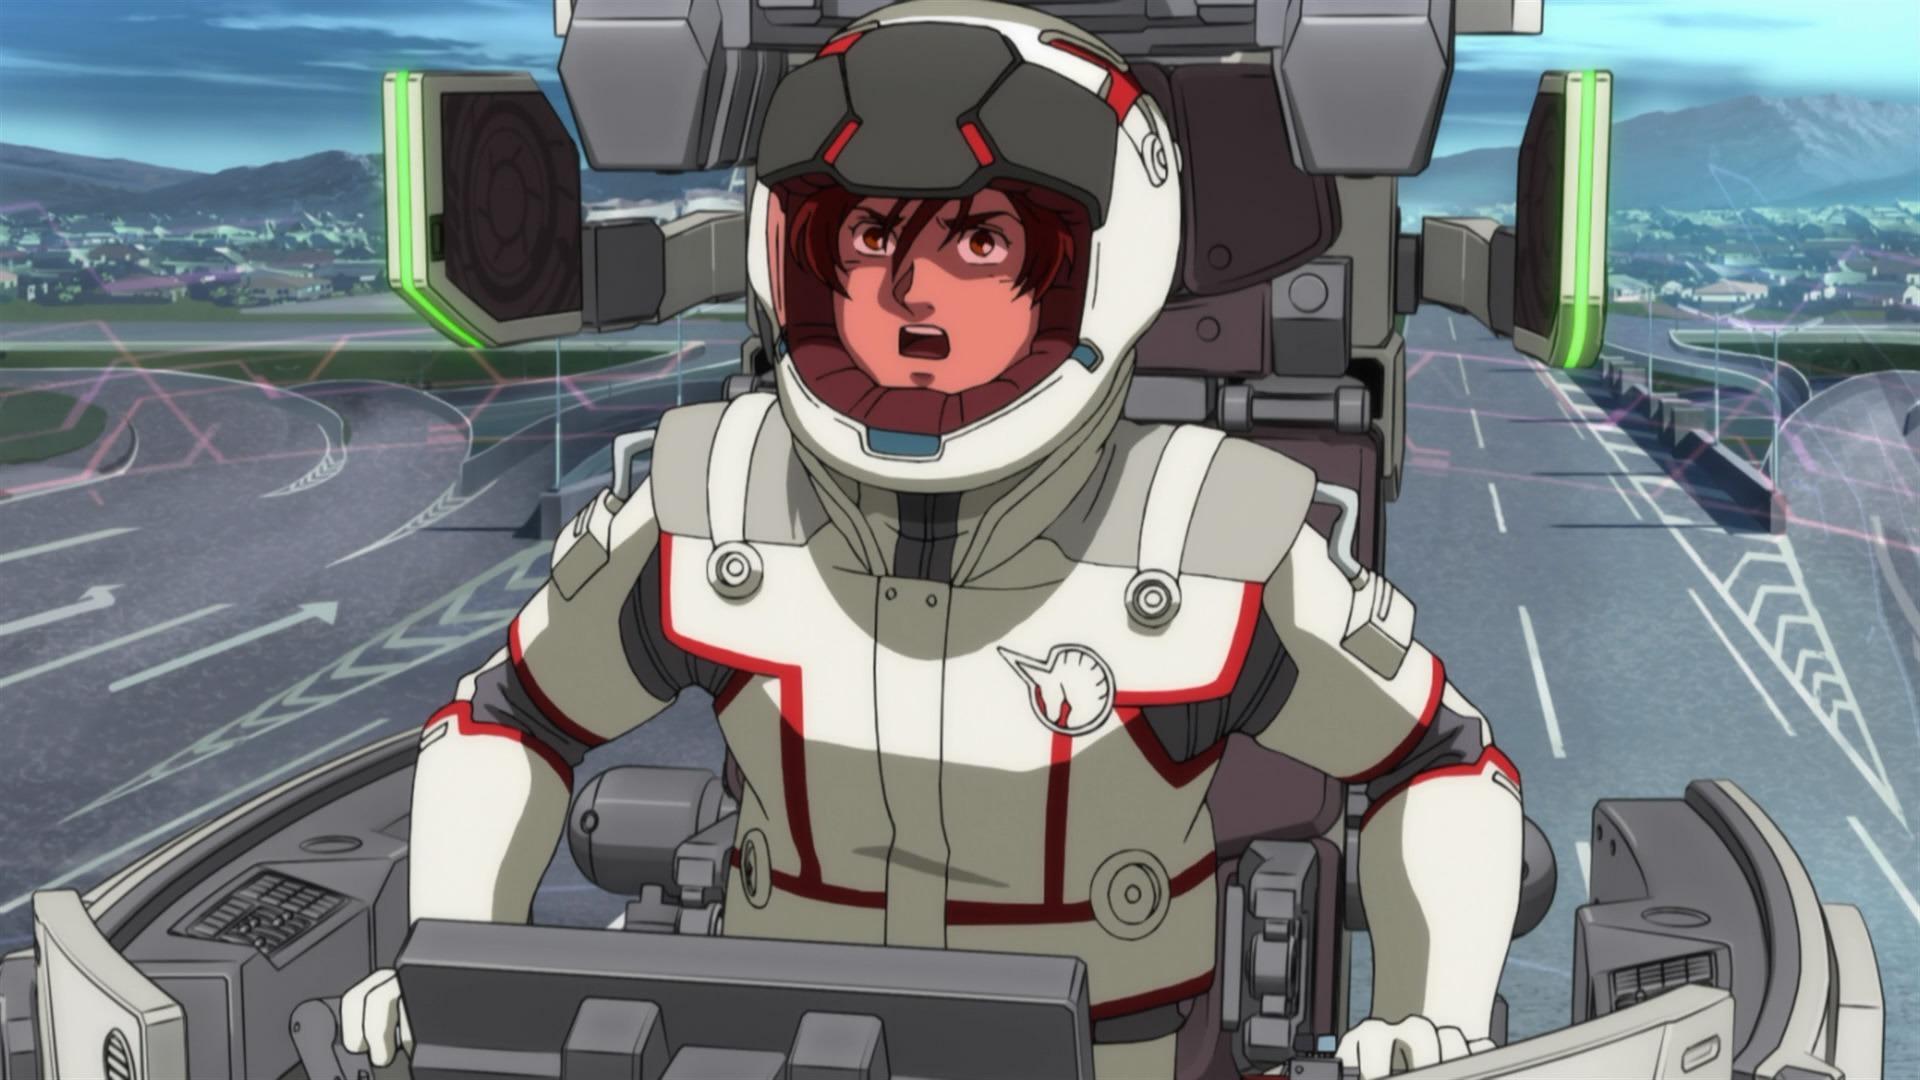 Sermon From The Mobile Suit Mobile Suit Gundam Unicorn